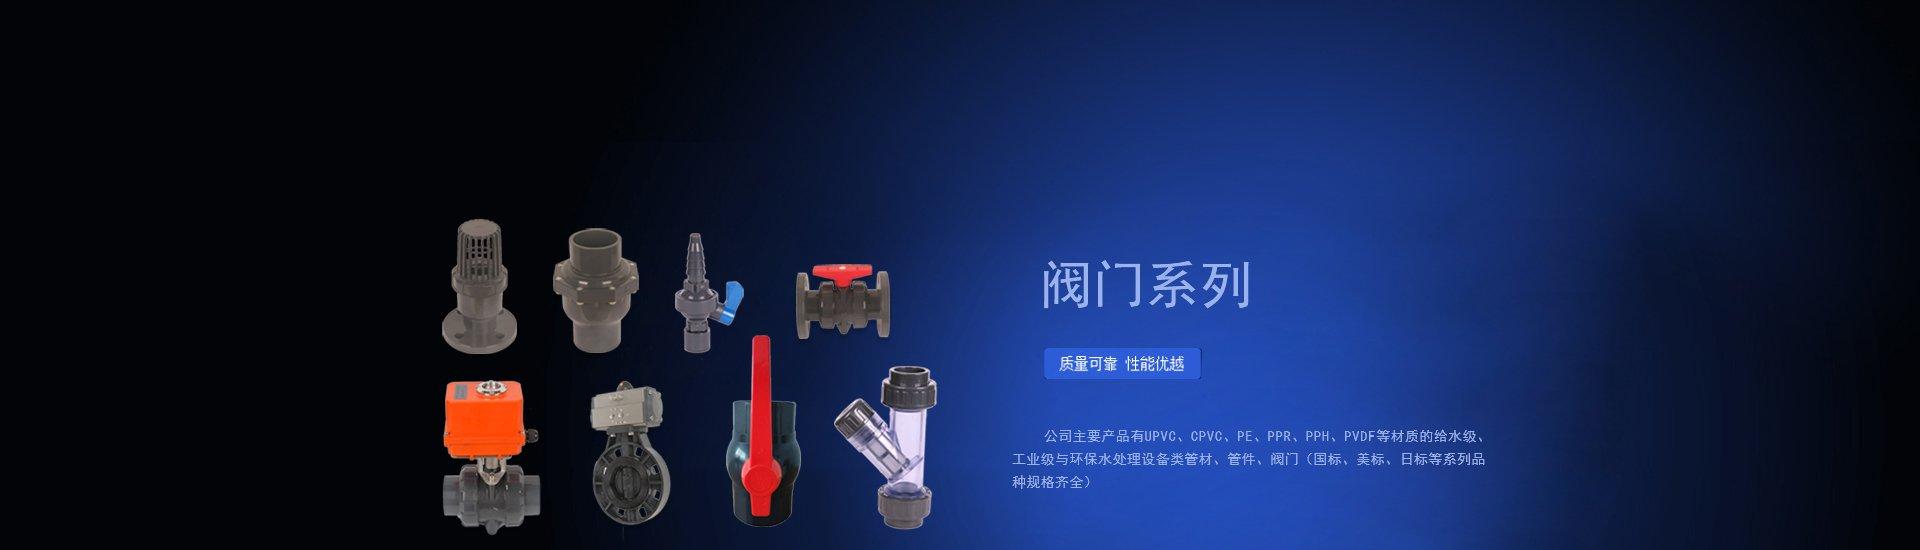 pvc球阀,PVC蝶阀,PE球阀,PVC双活接球阀产品途